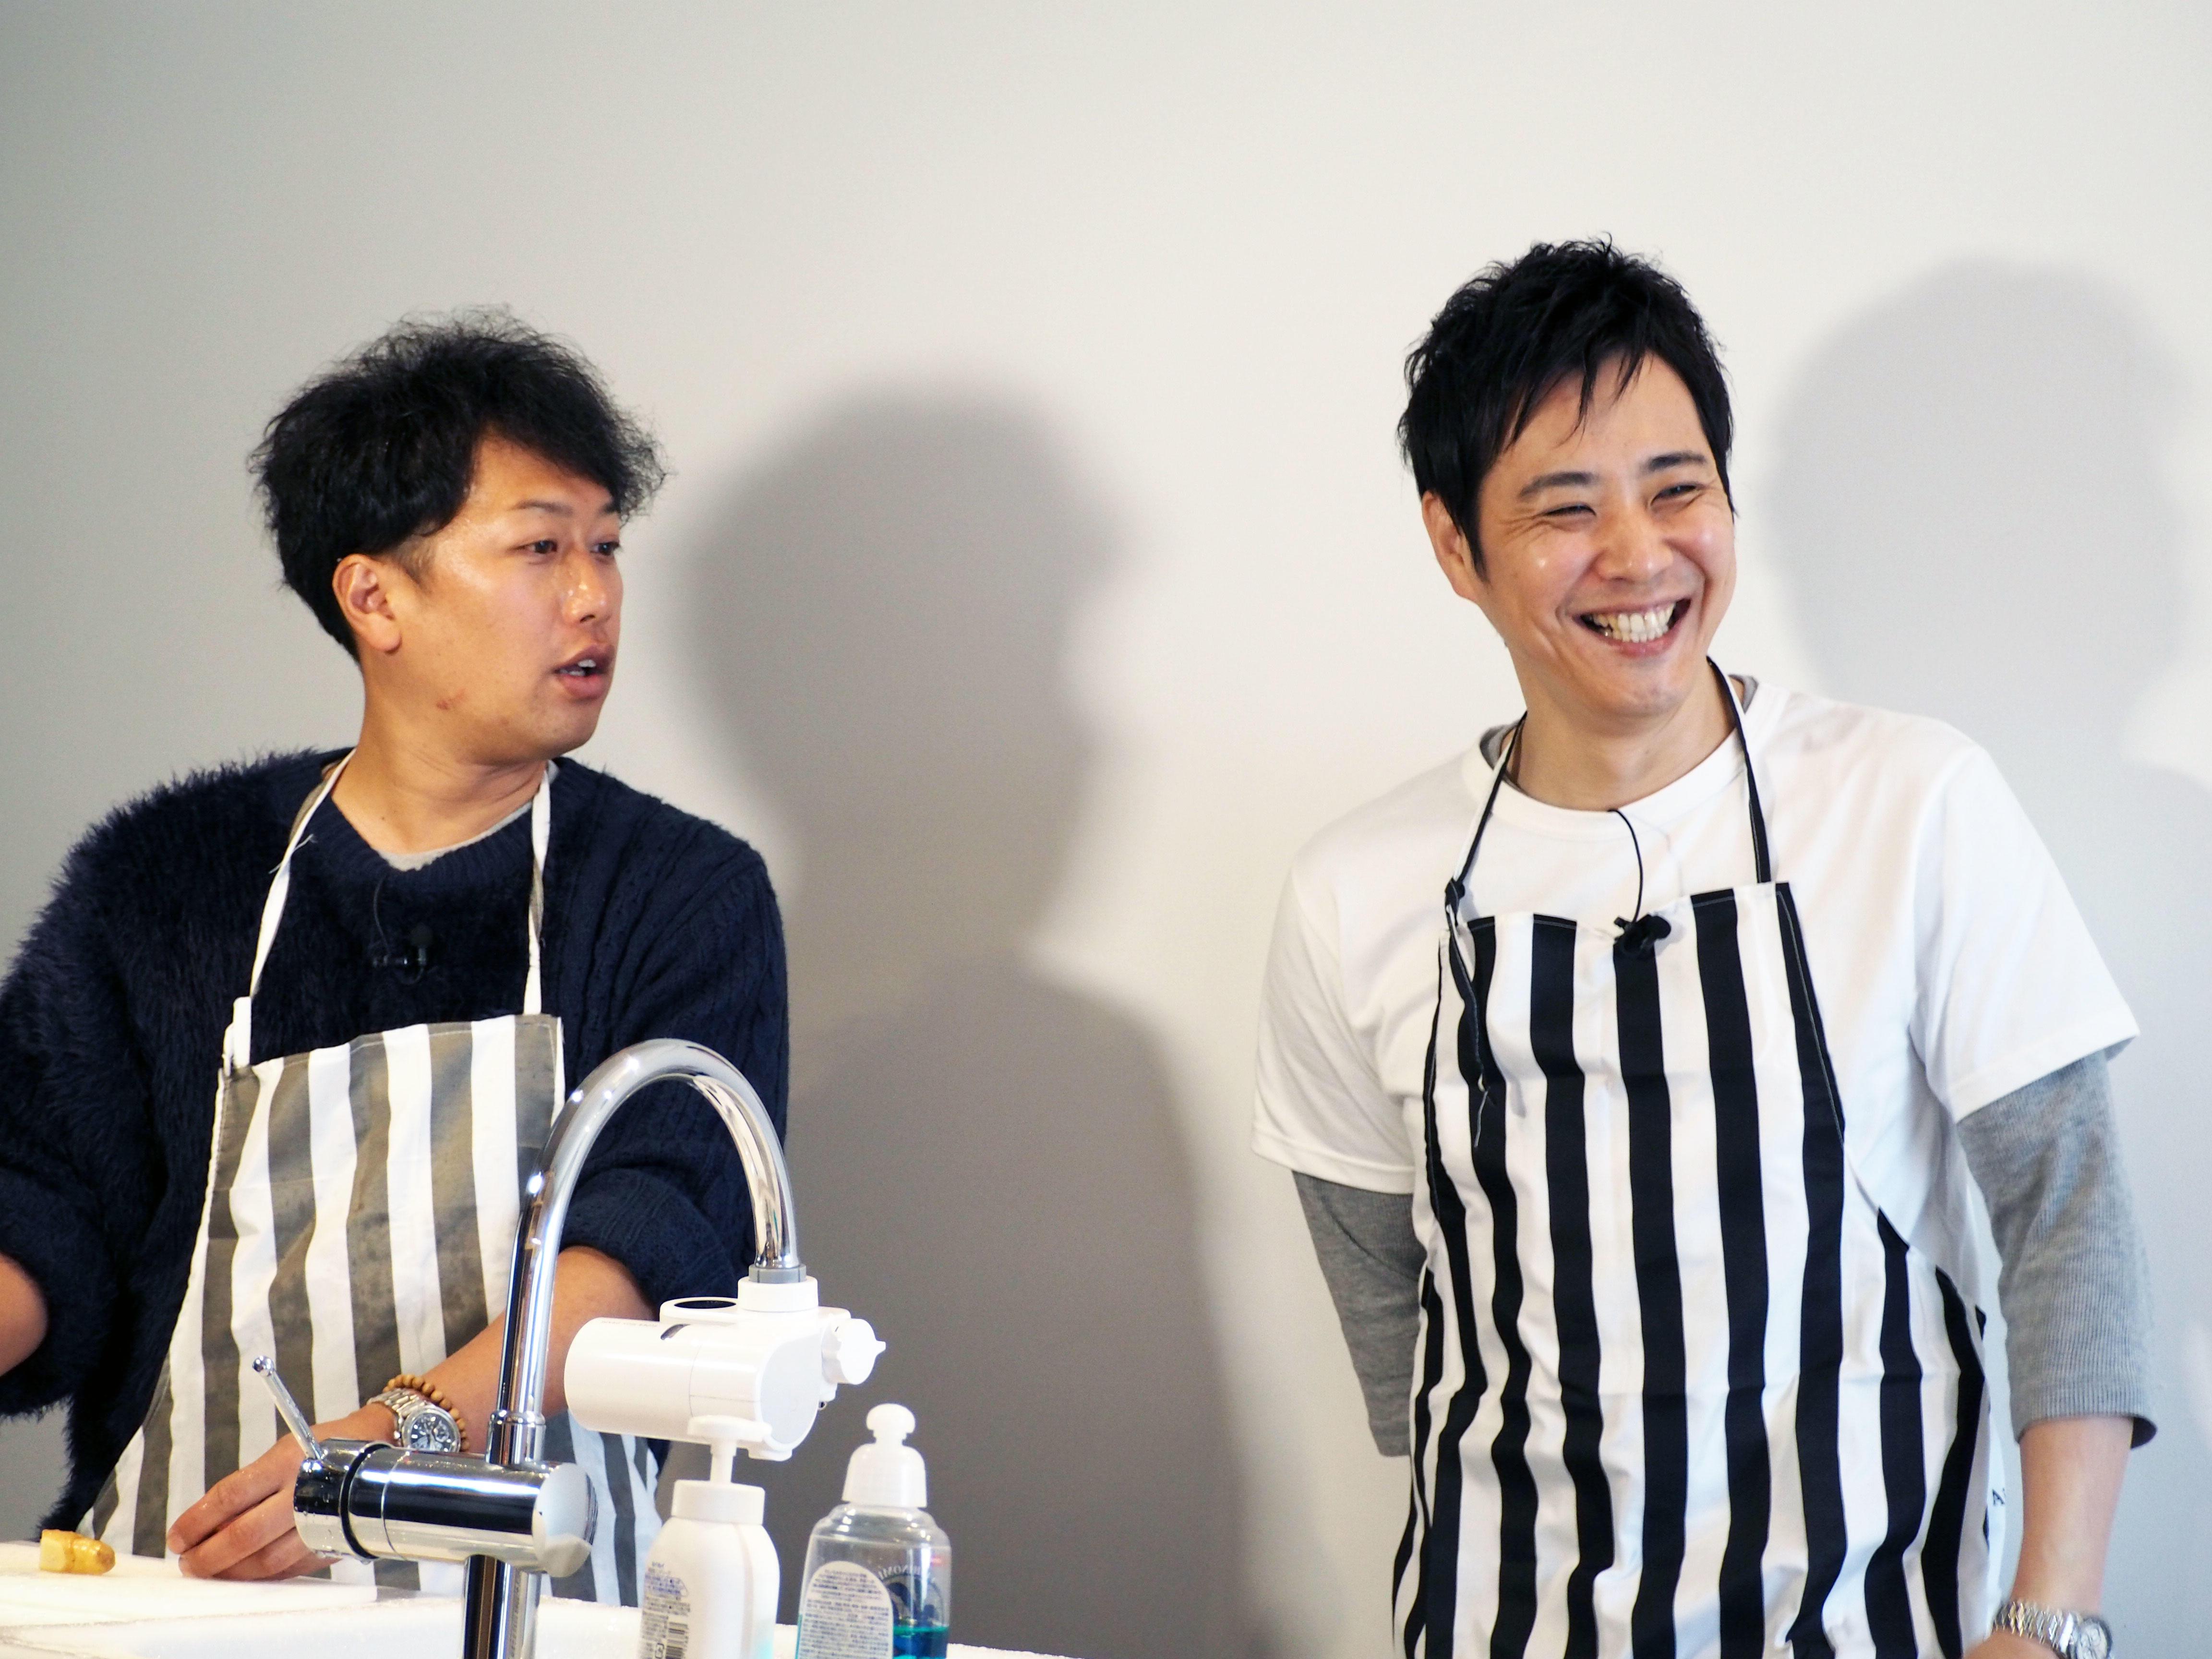 http://news.yoshimoto.co.jp/20180308011323-3c152720600110890f58782418f71aea914803c3.jpg